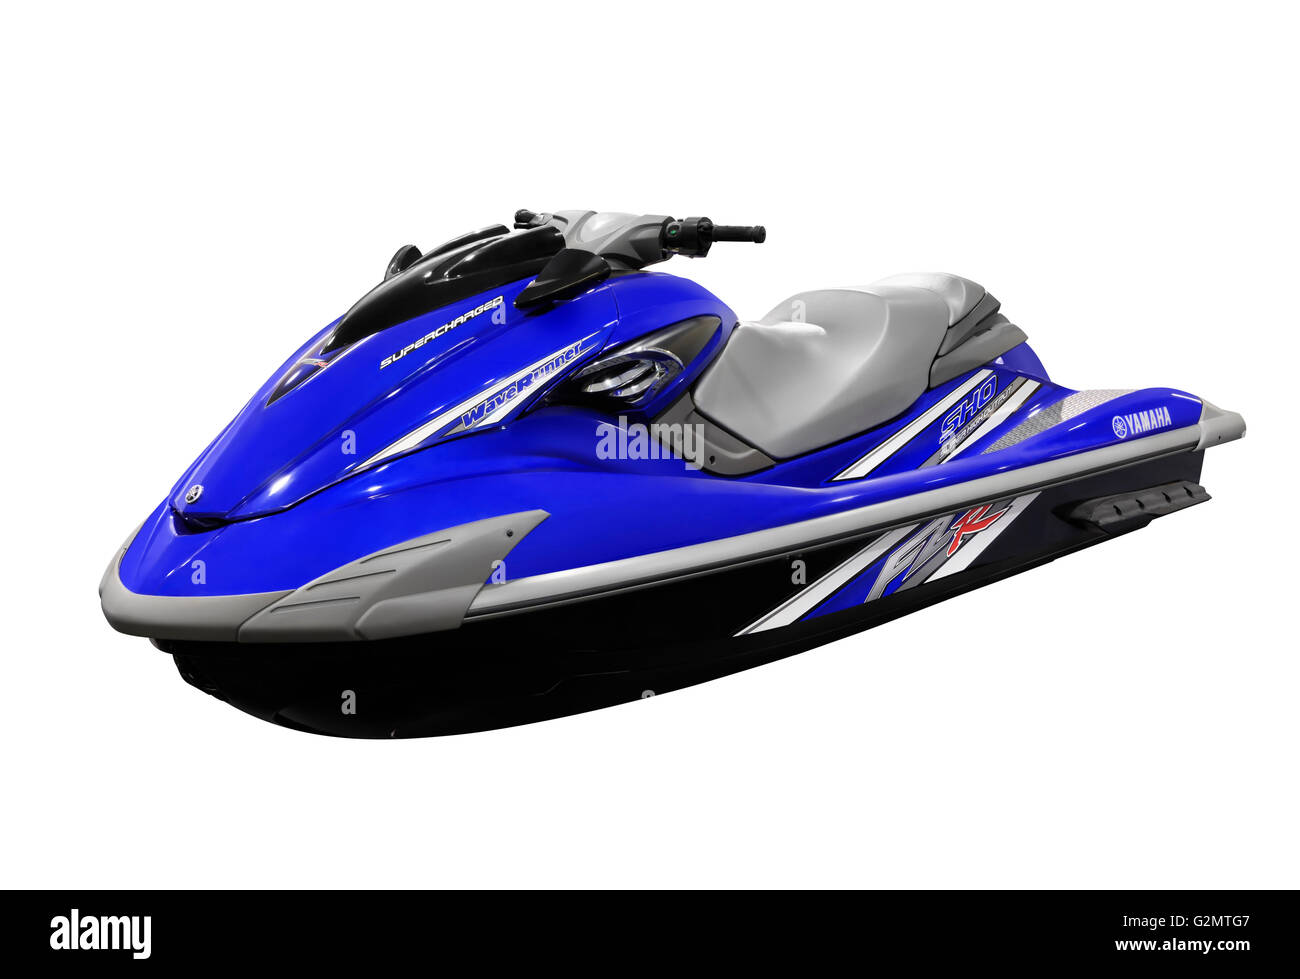 Yamaha waverunner sho supercharged personal water craft for Yamaha jet ski waverunner